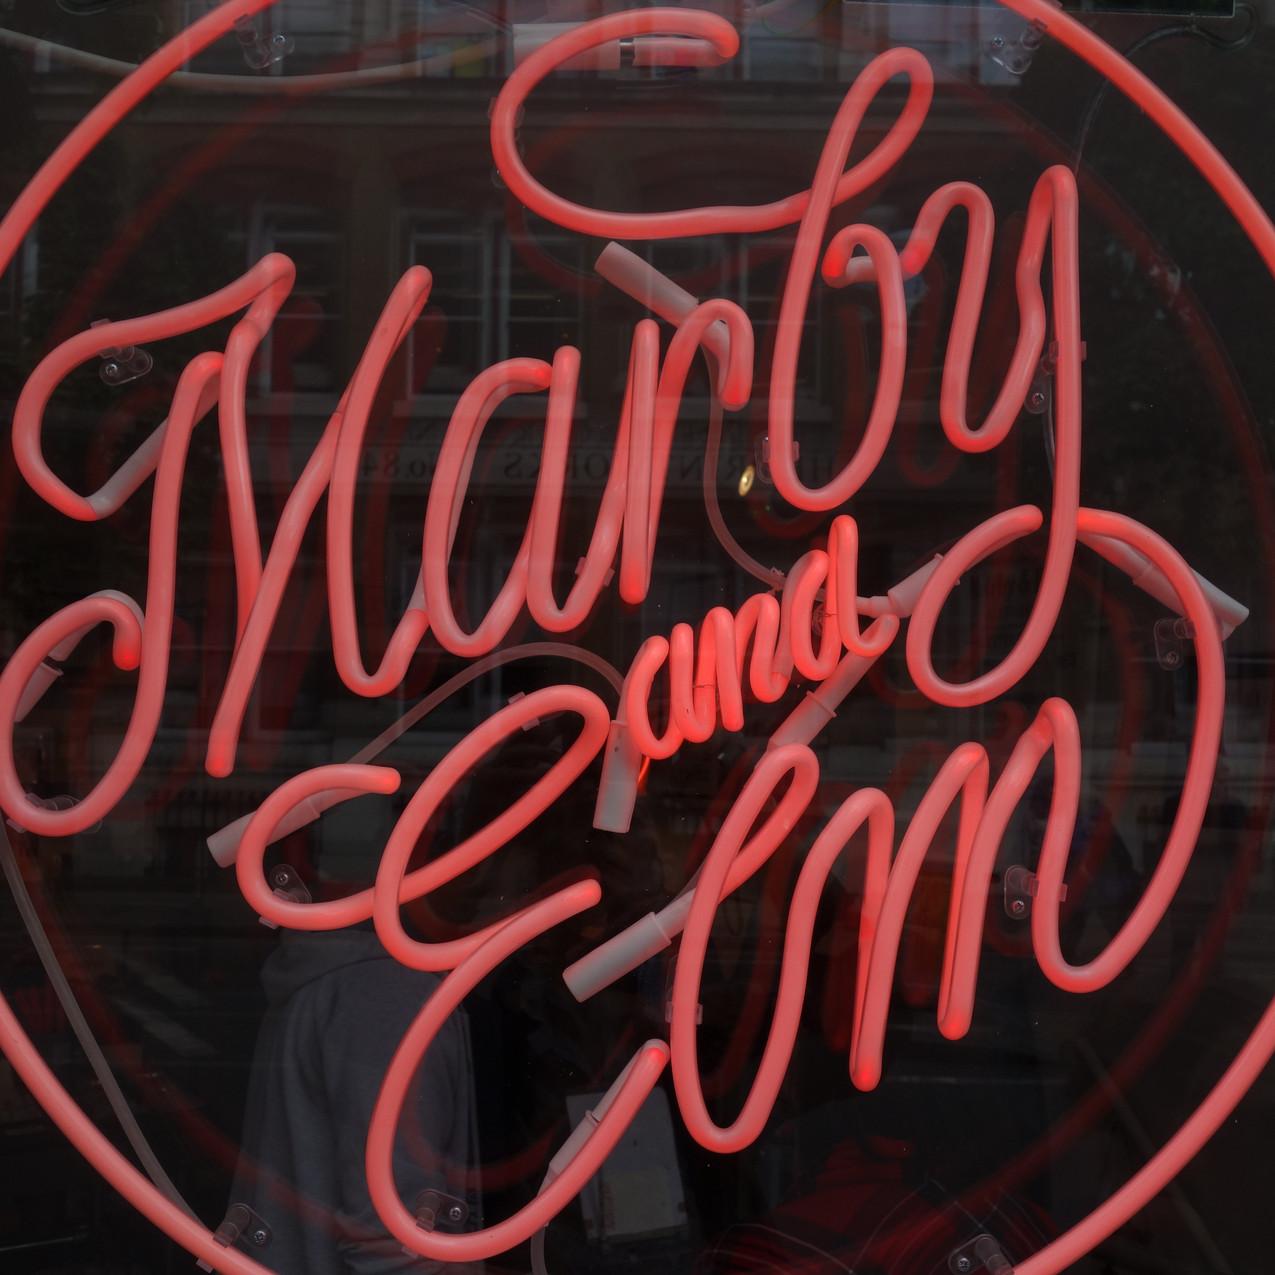 Marby & Elm